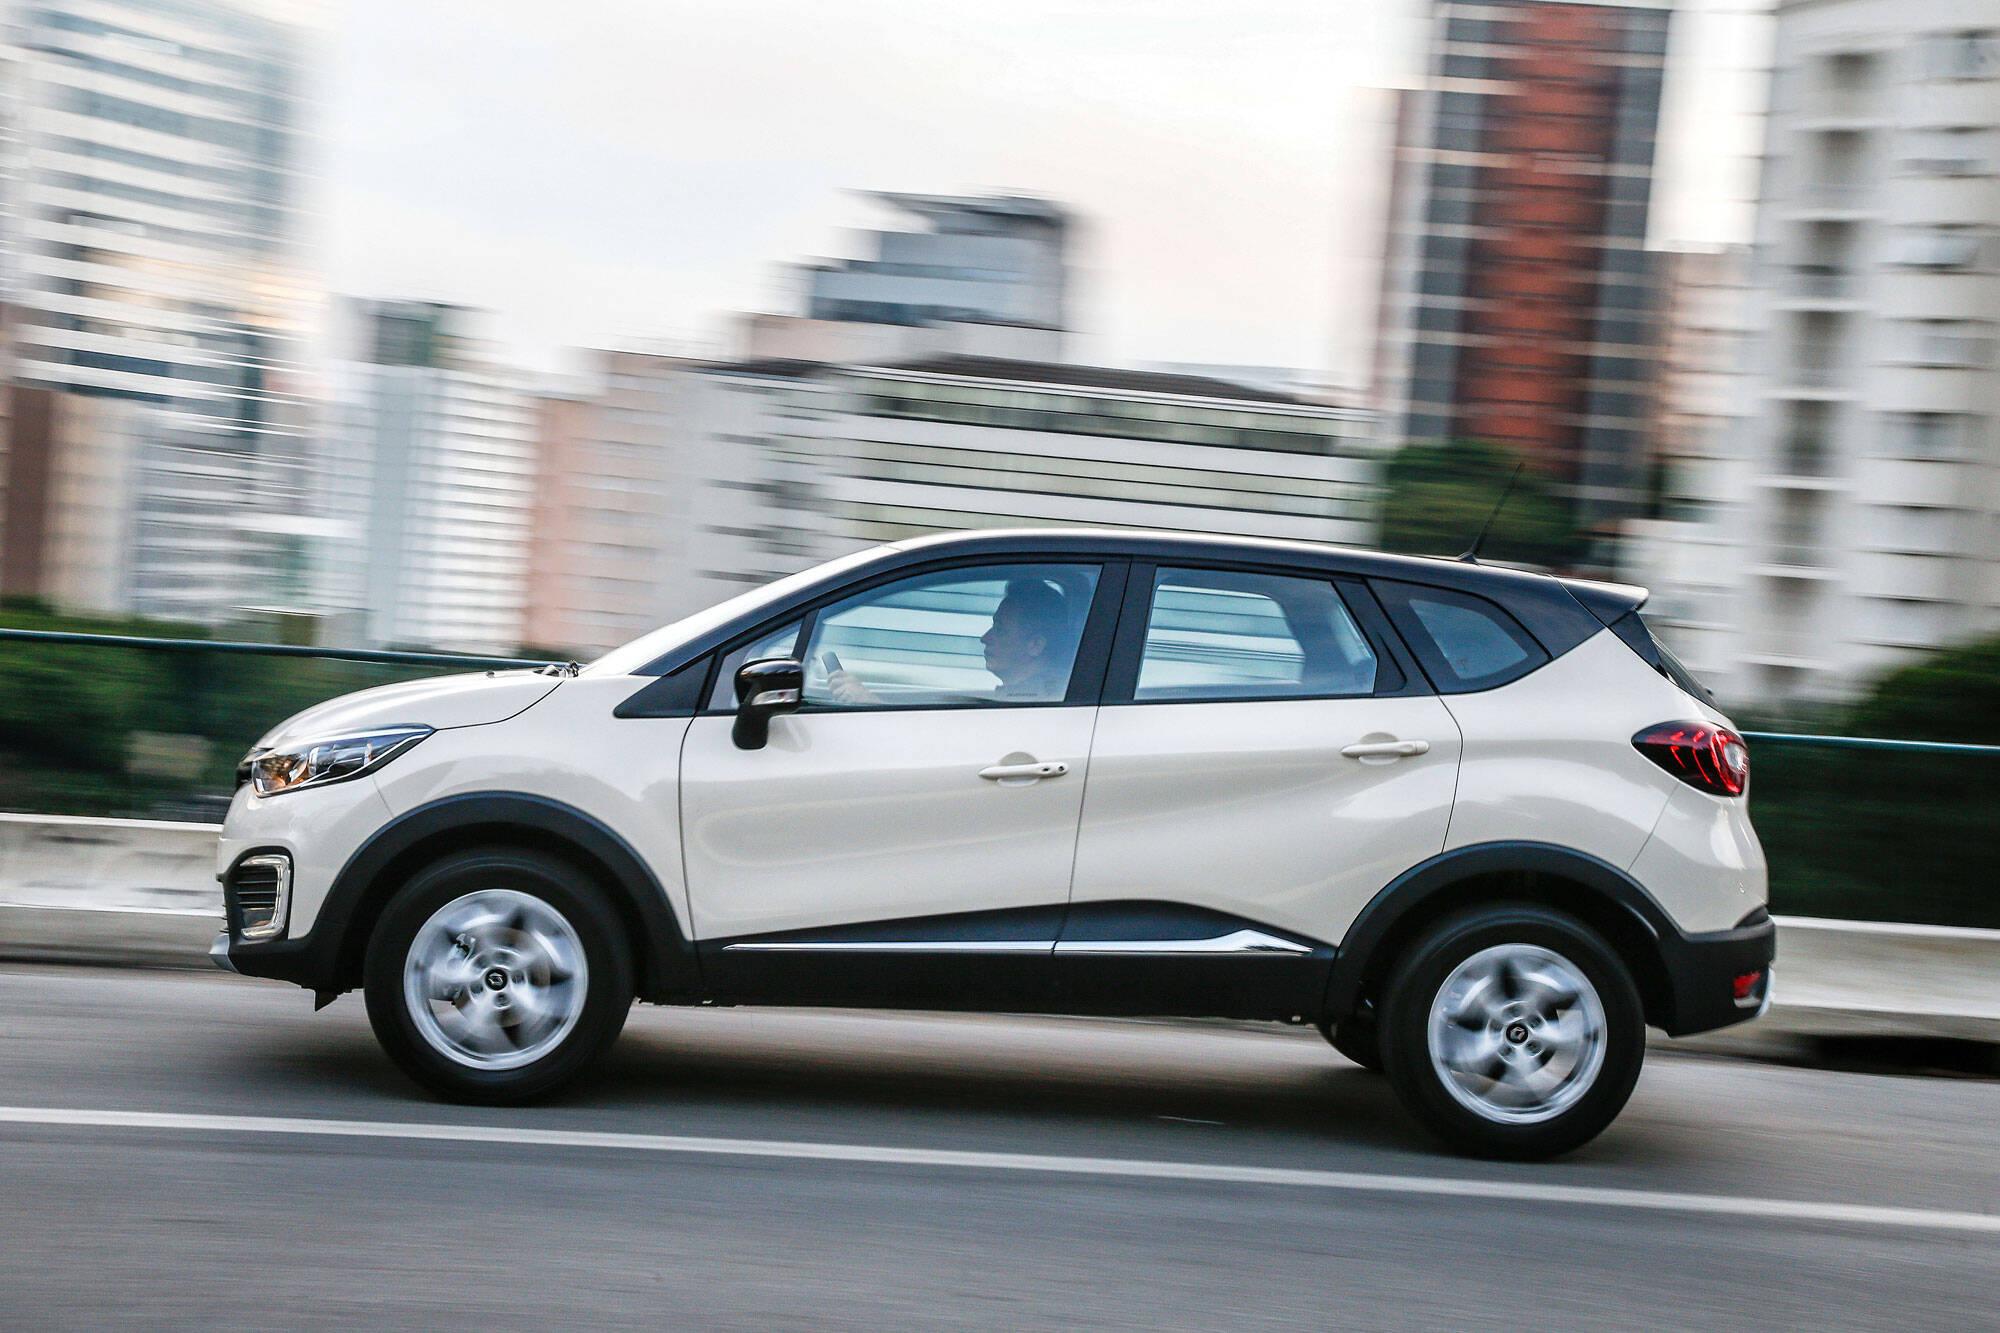 Renault Captur. Foto: divulgação/Renault